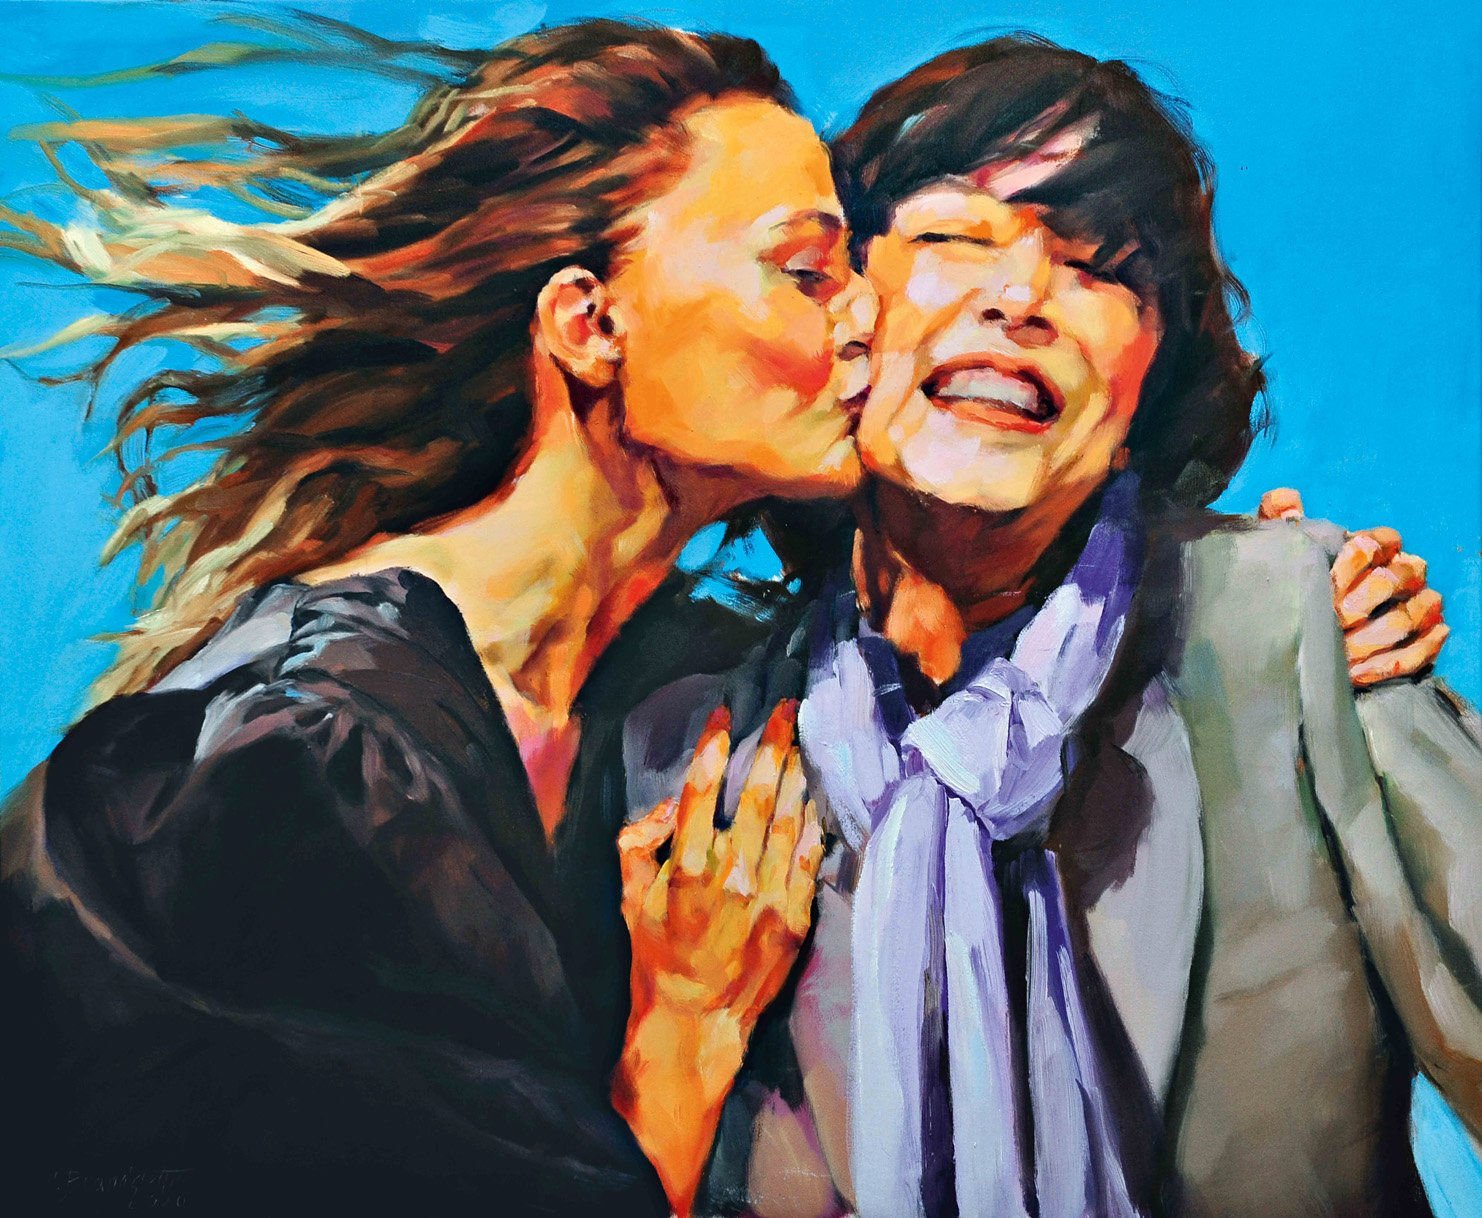 Ingrid Brandstetter Werkzyklus En Voyage in der Galerie Kovacek & Zetter